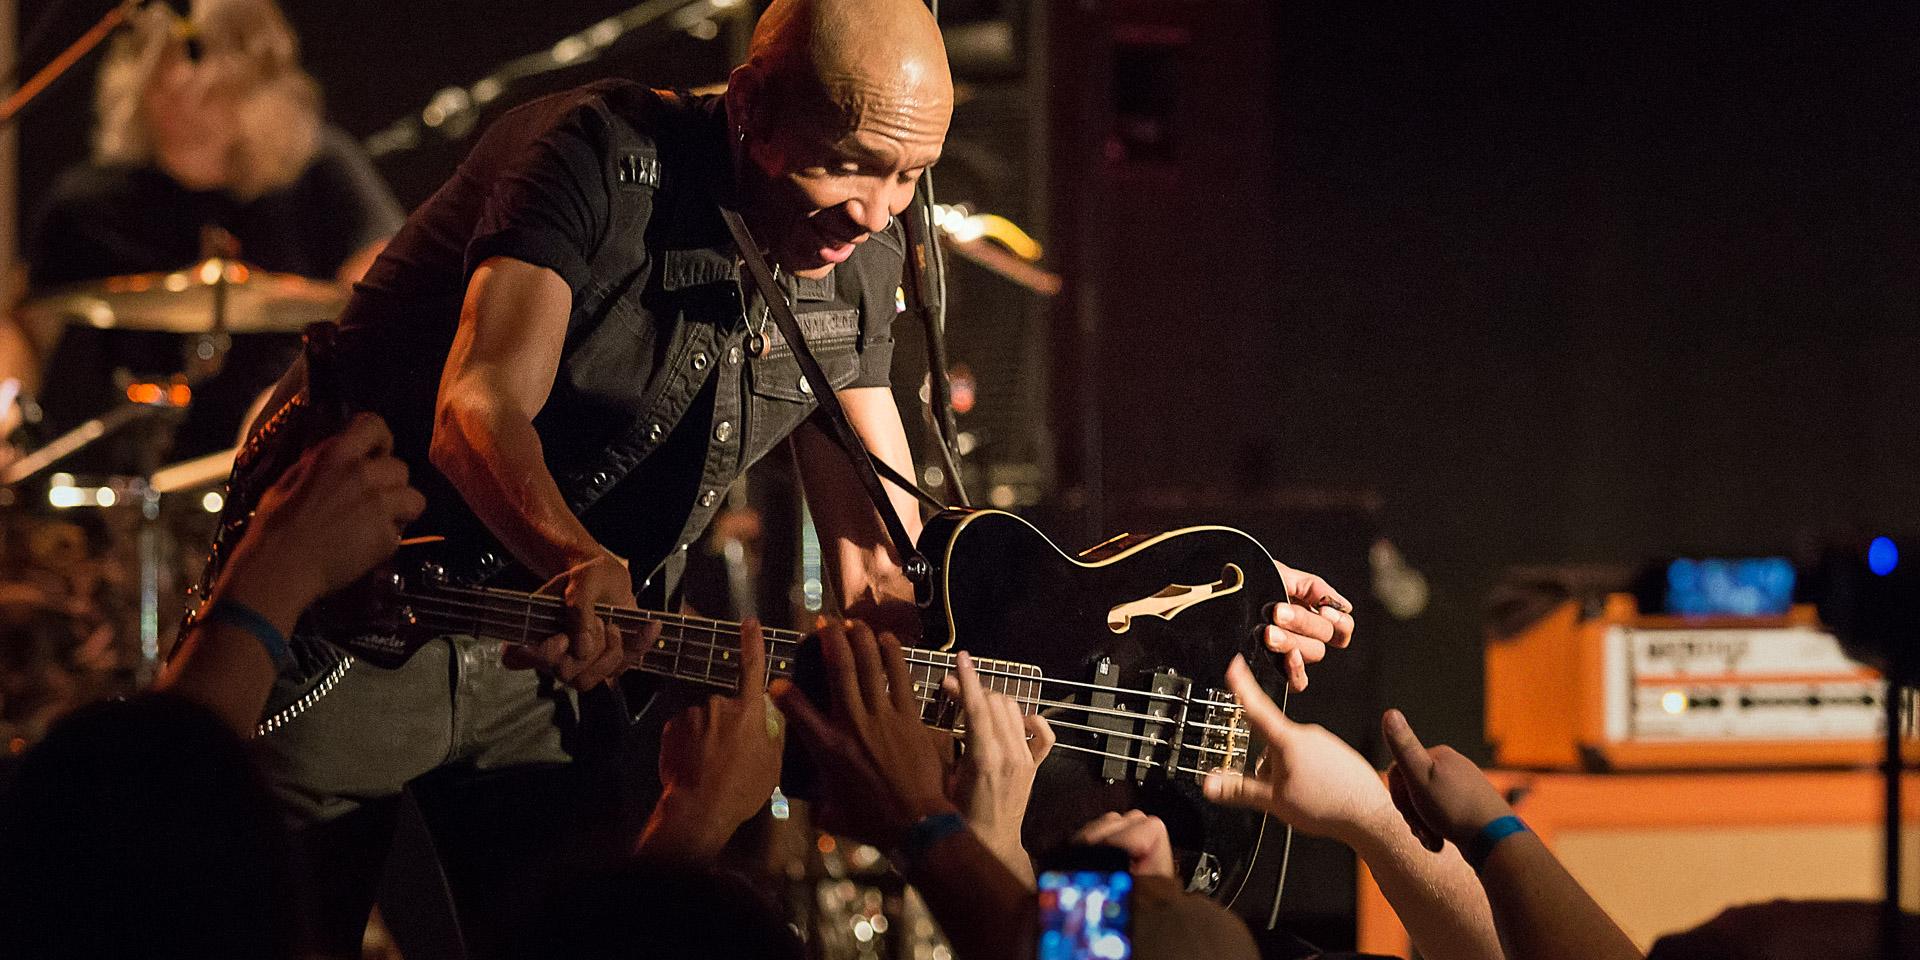 King's X: Crowd helps bassist Dug Pinnick play bass